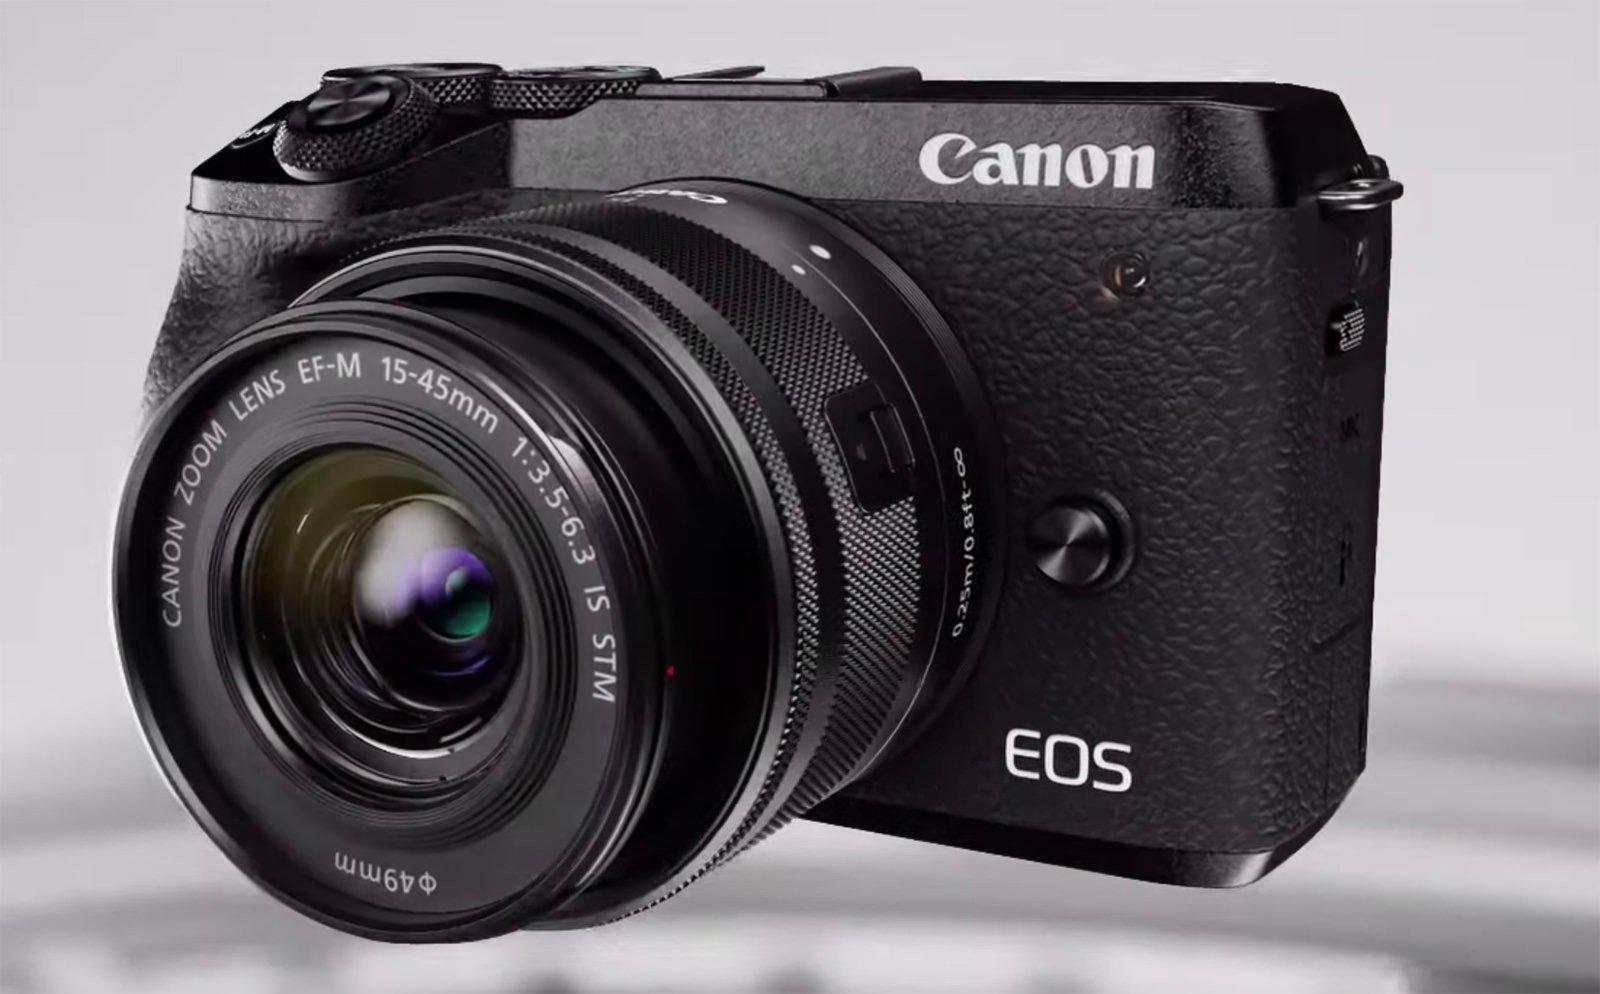 Canon EOS M6 Mark II Leaked: 32 5MP Sensor, 4K Video, 30fps